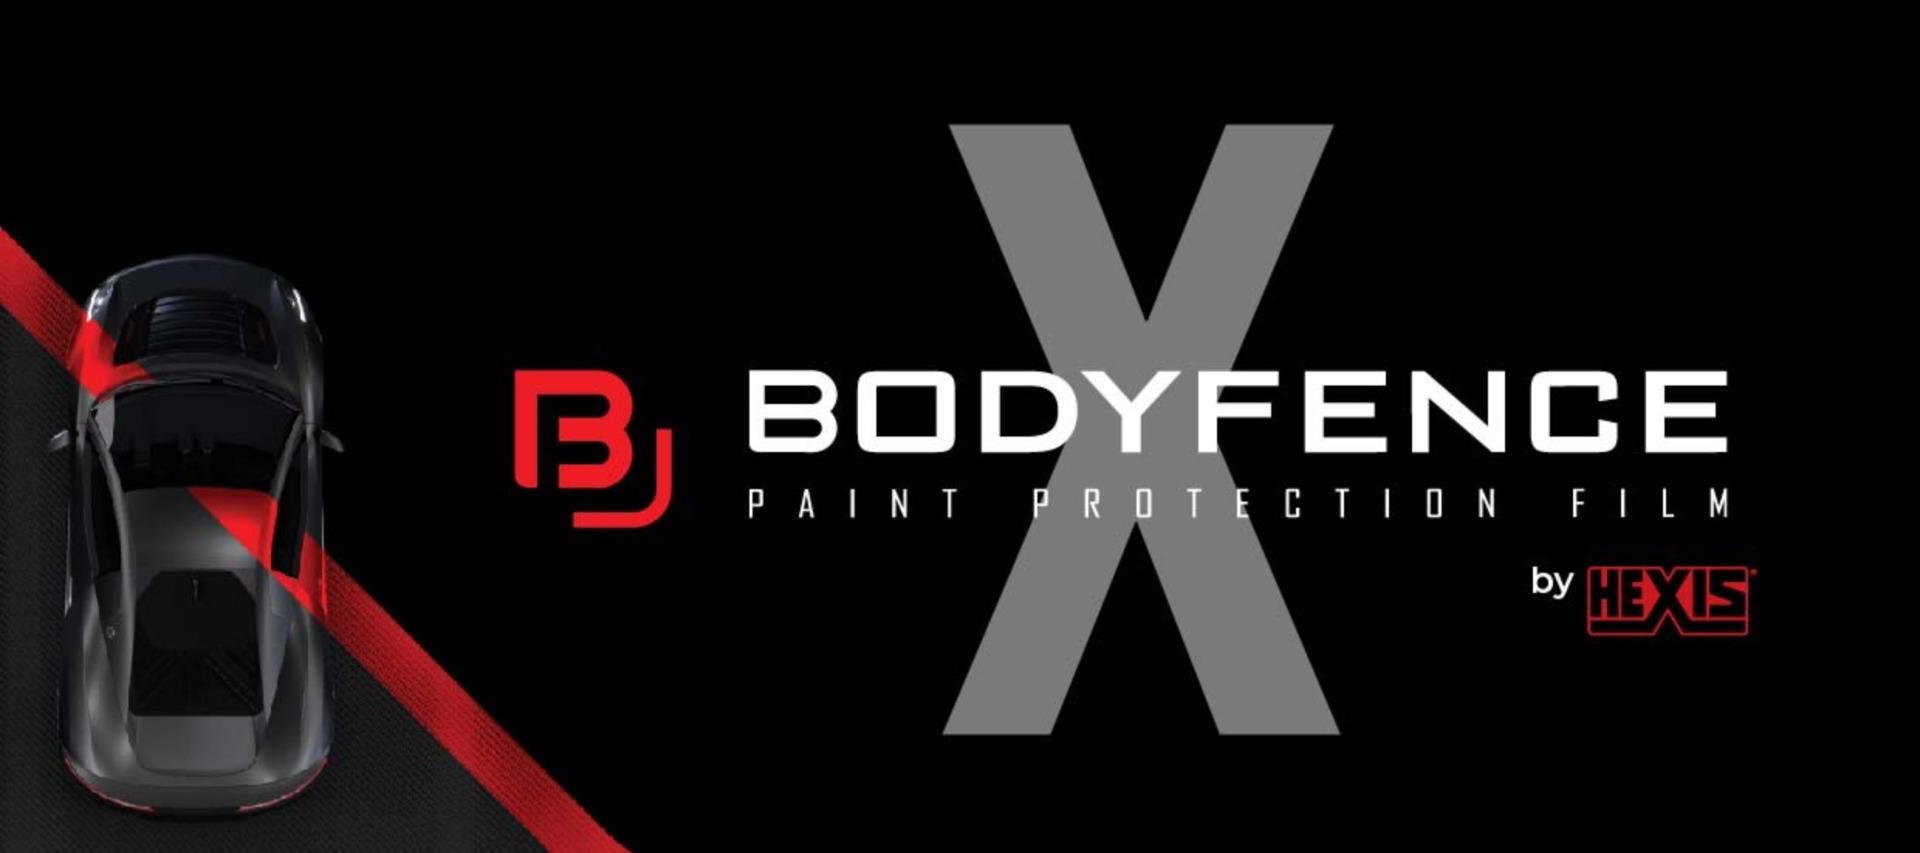 Bodyfence X